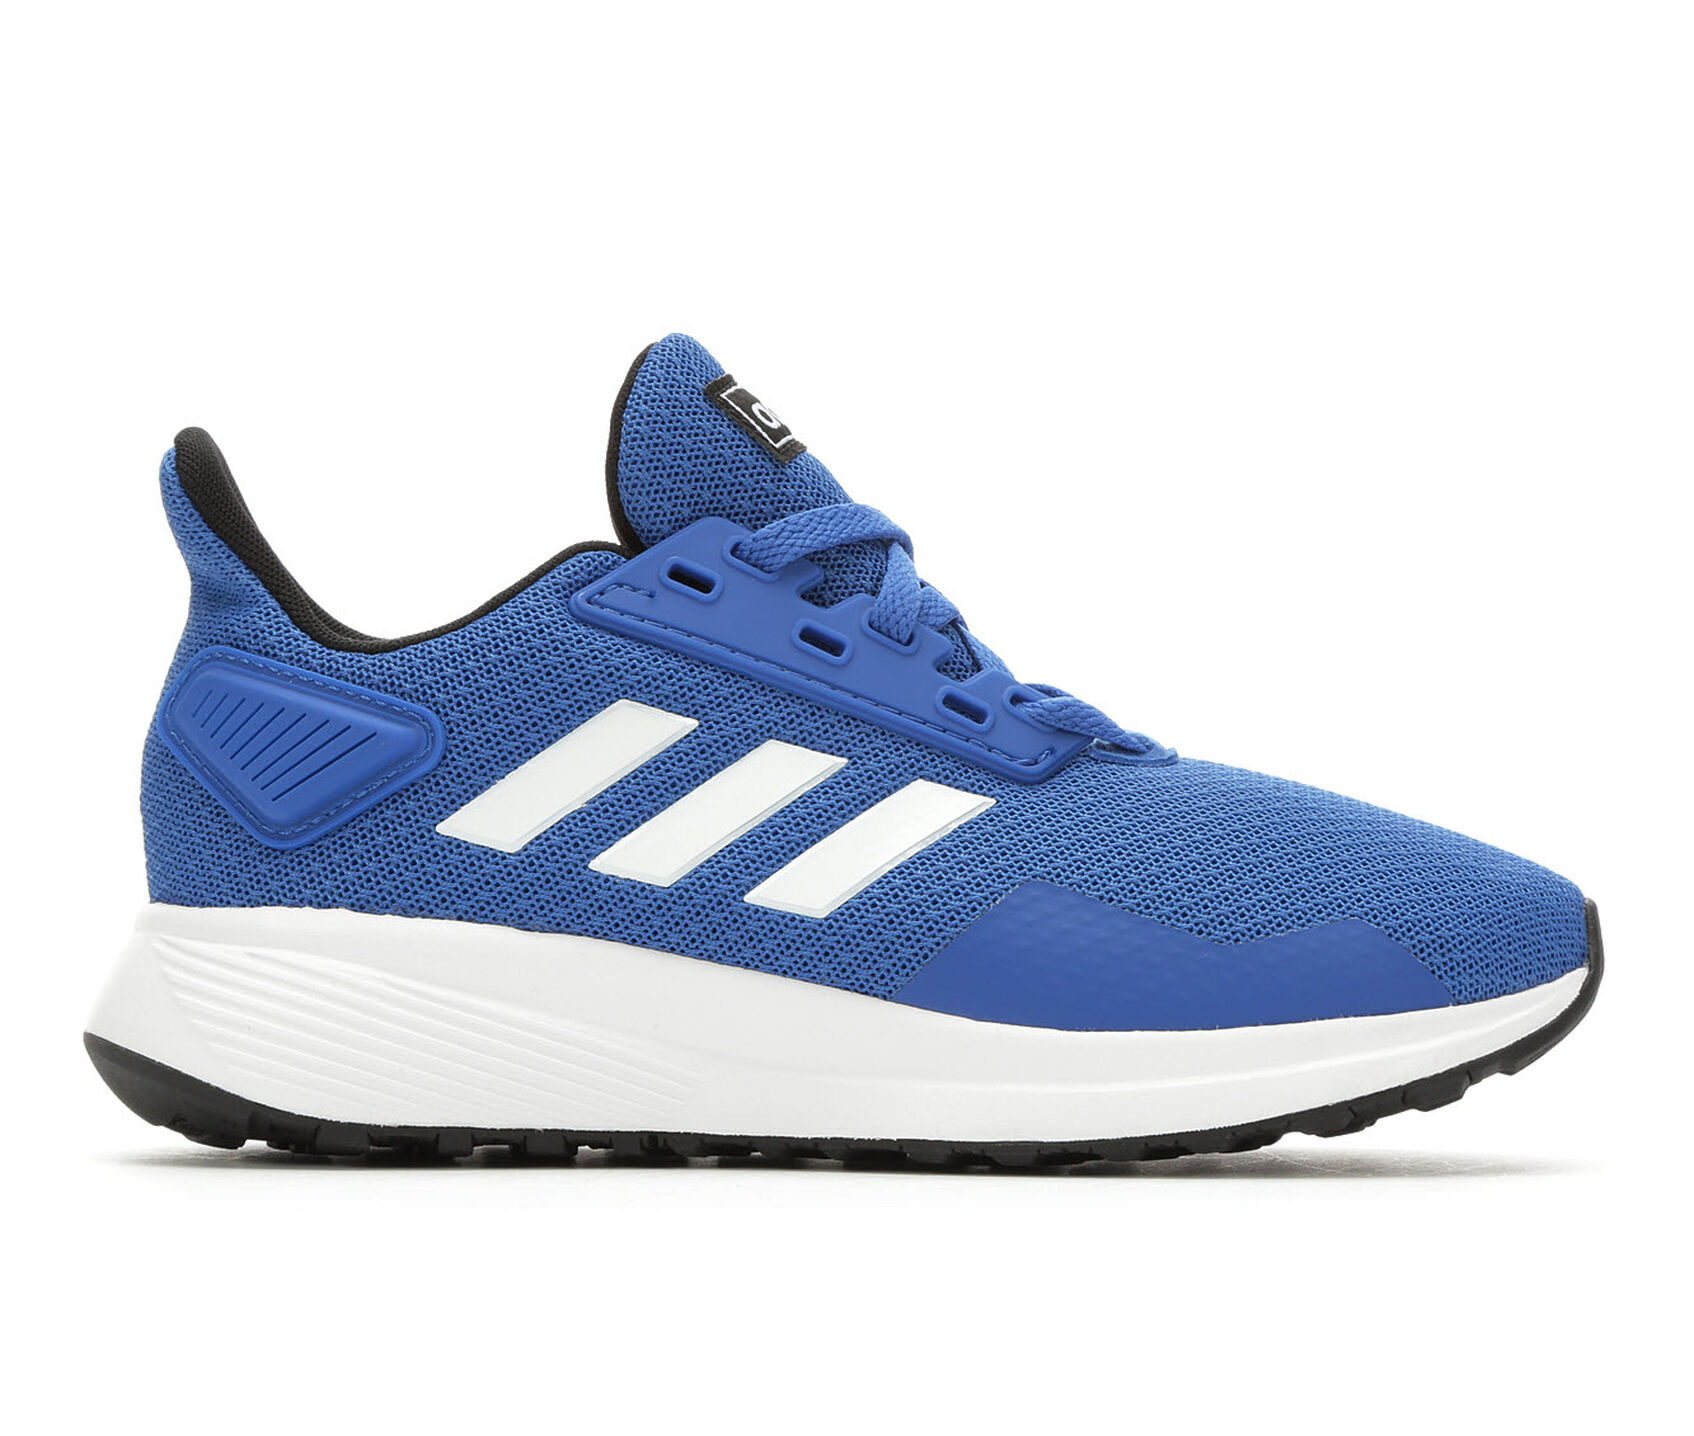 détaillant en ligne 1103b 8286c Boys' Adidas Little Kid & Big Kid Duramo Running Shoes